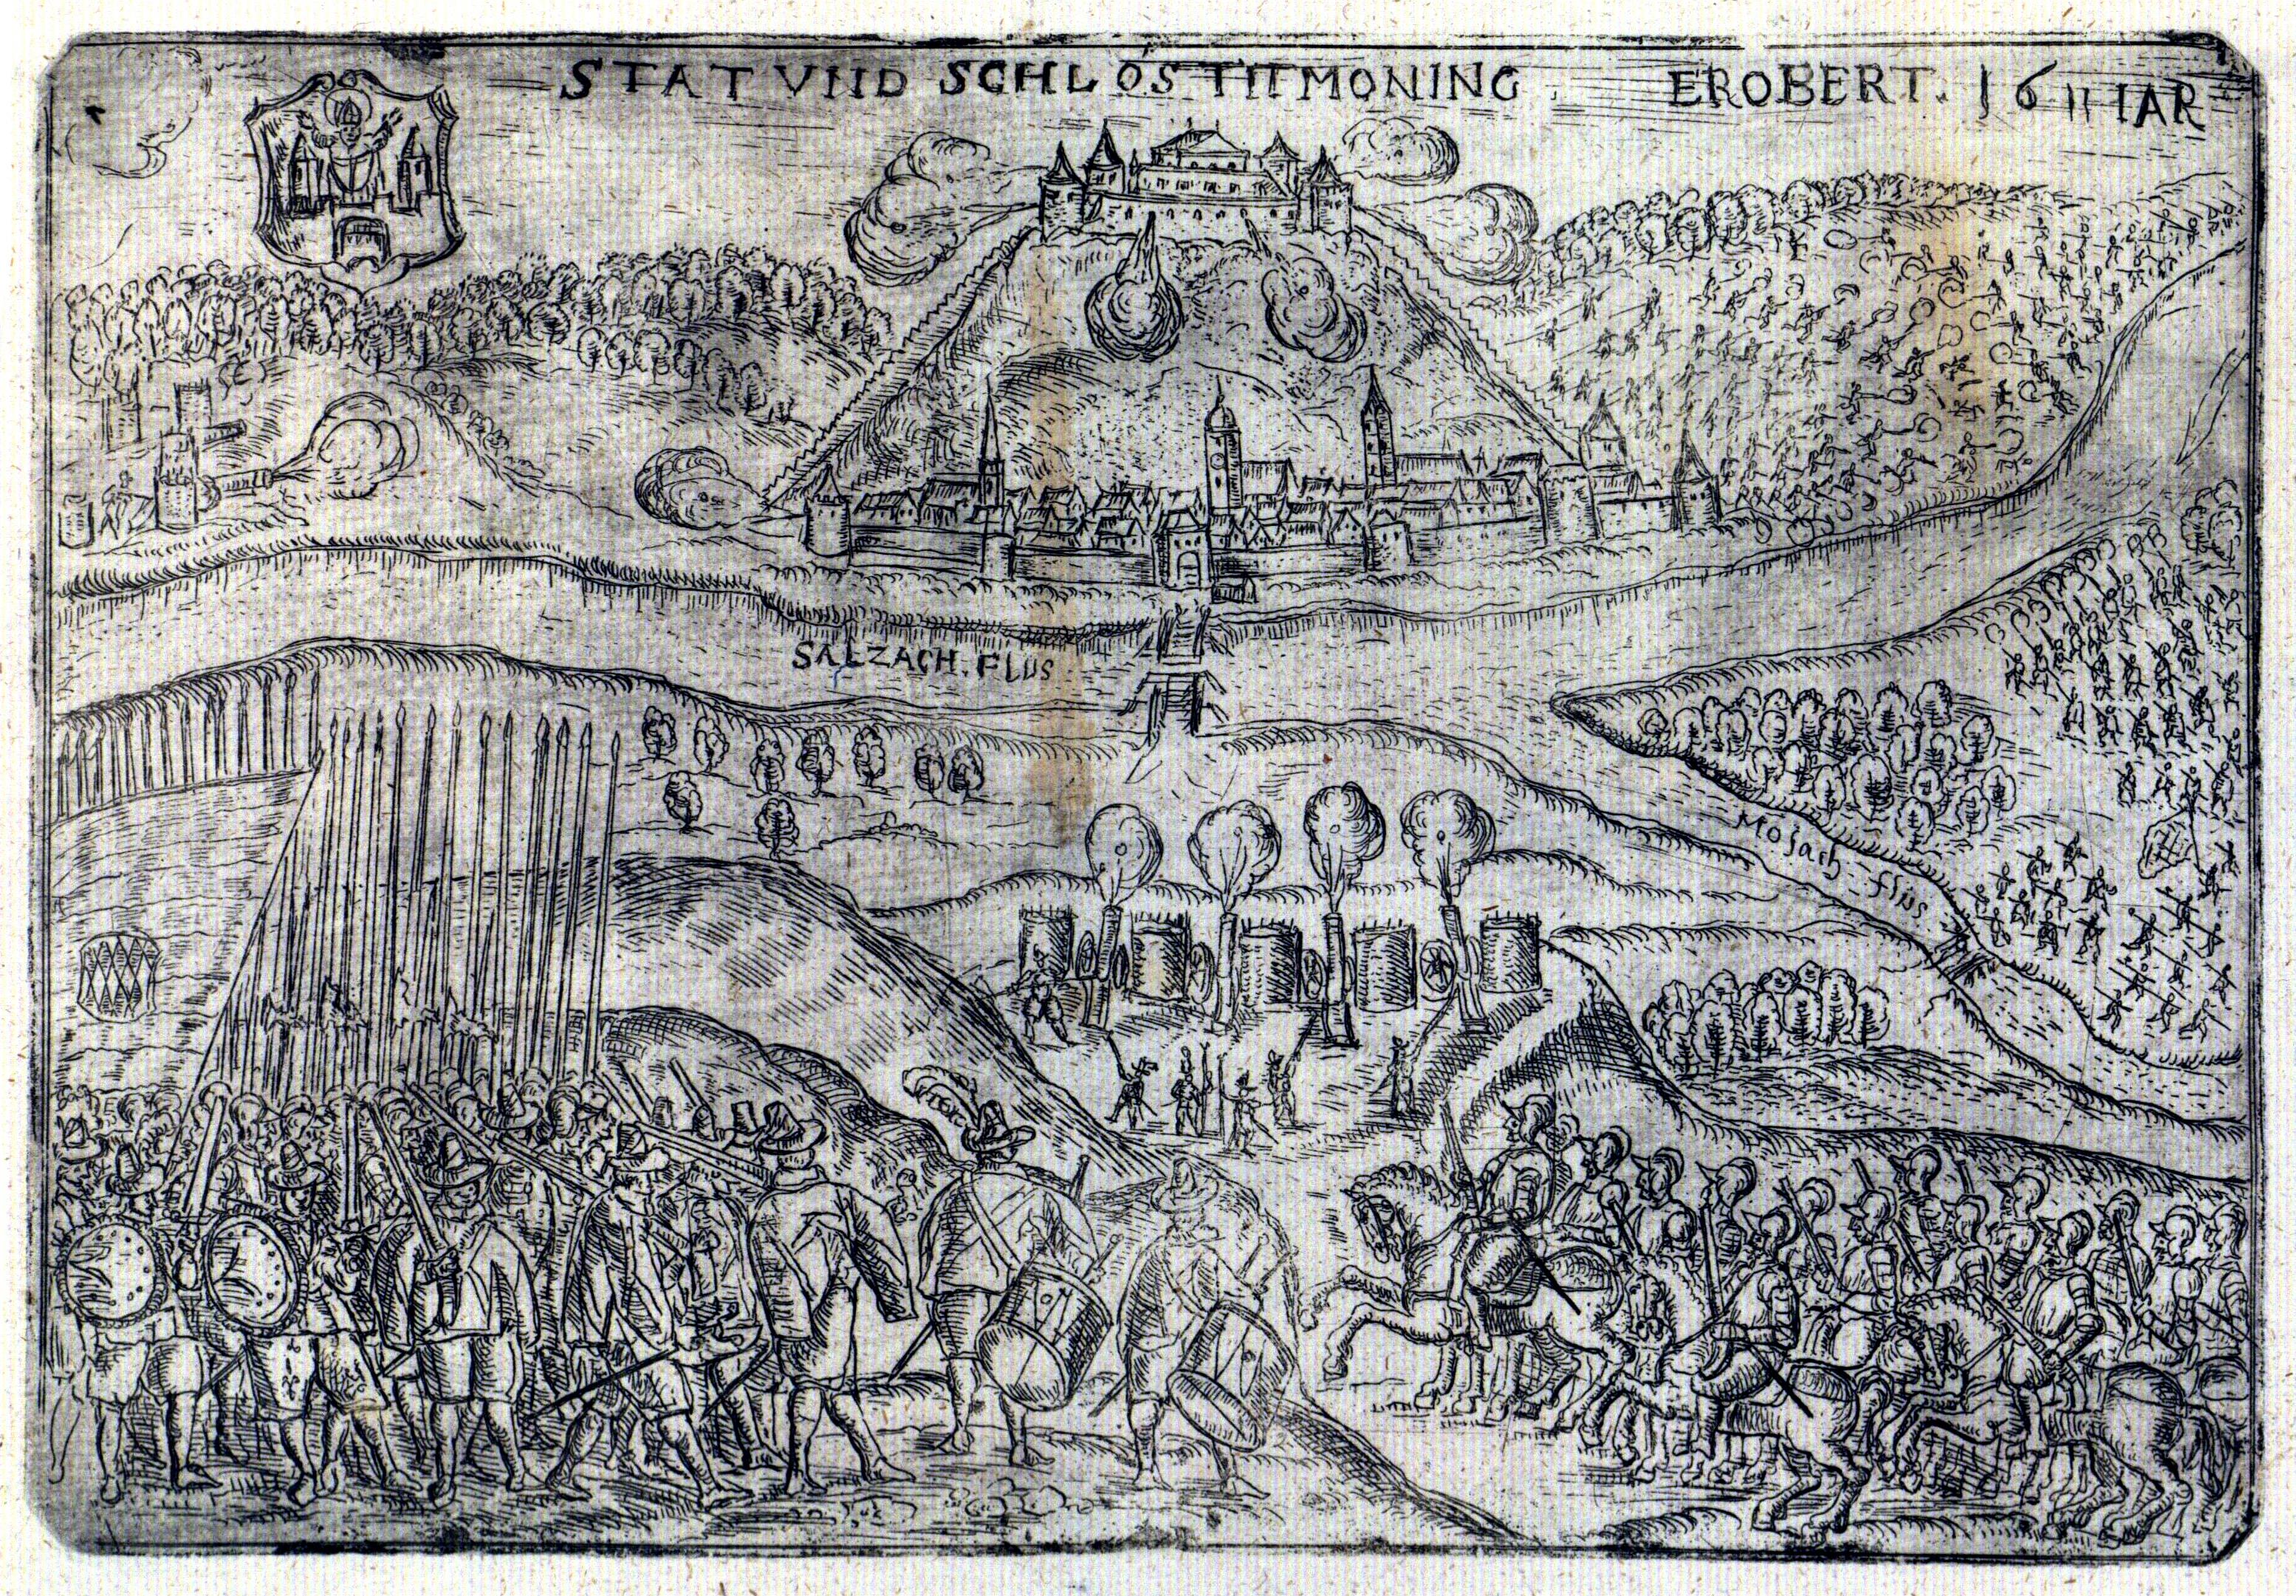 File:Stat und Schlos Titmoning erobert 1611 Iar.jpg